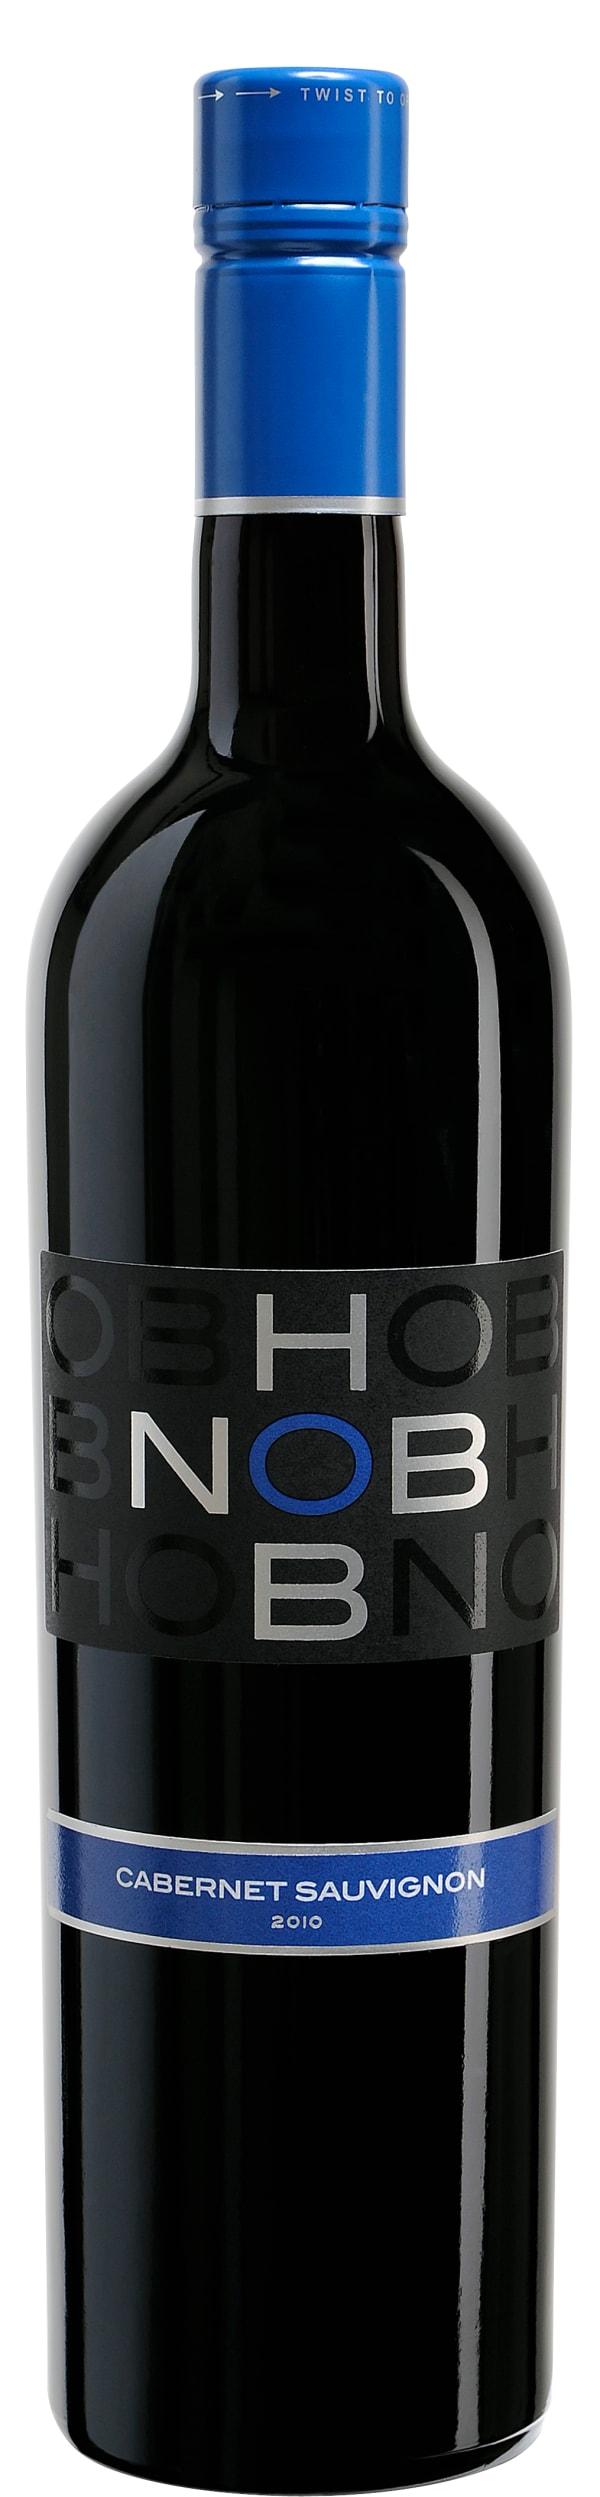 Hob Nob Cabernet Sauvignon 2017